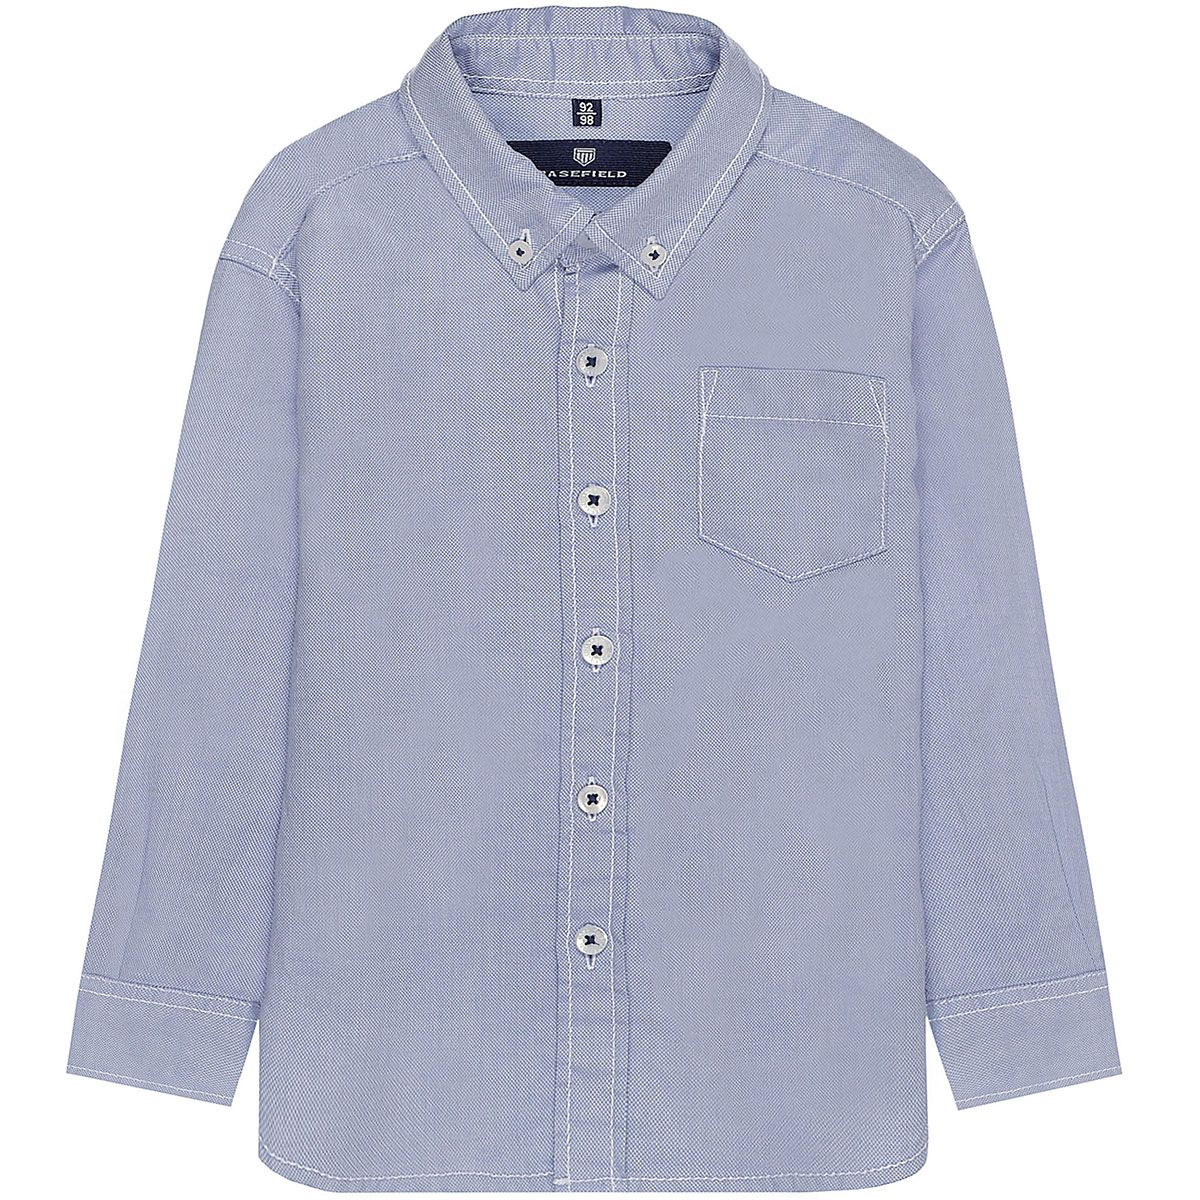 BASEFIELD Hemd - Oxford Blue